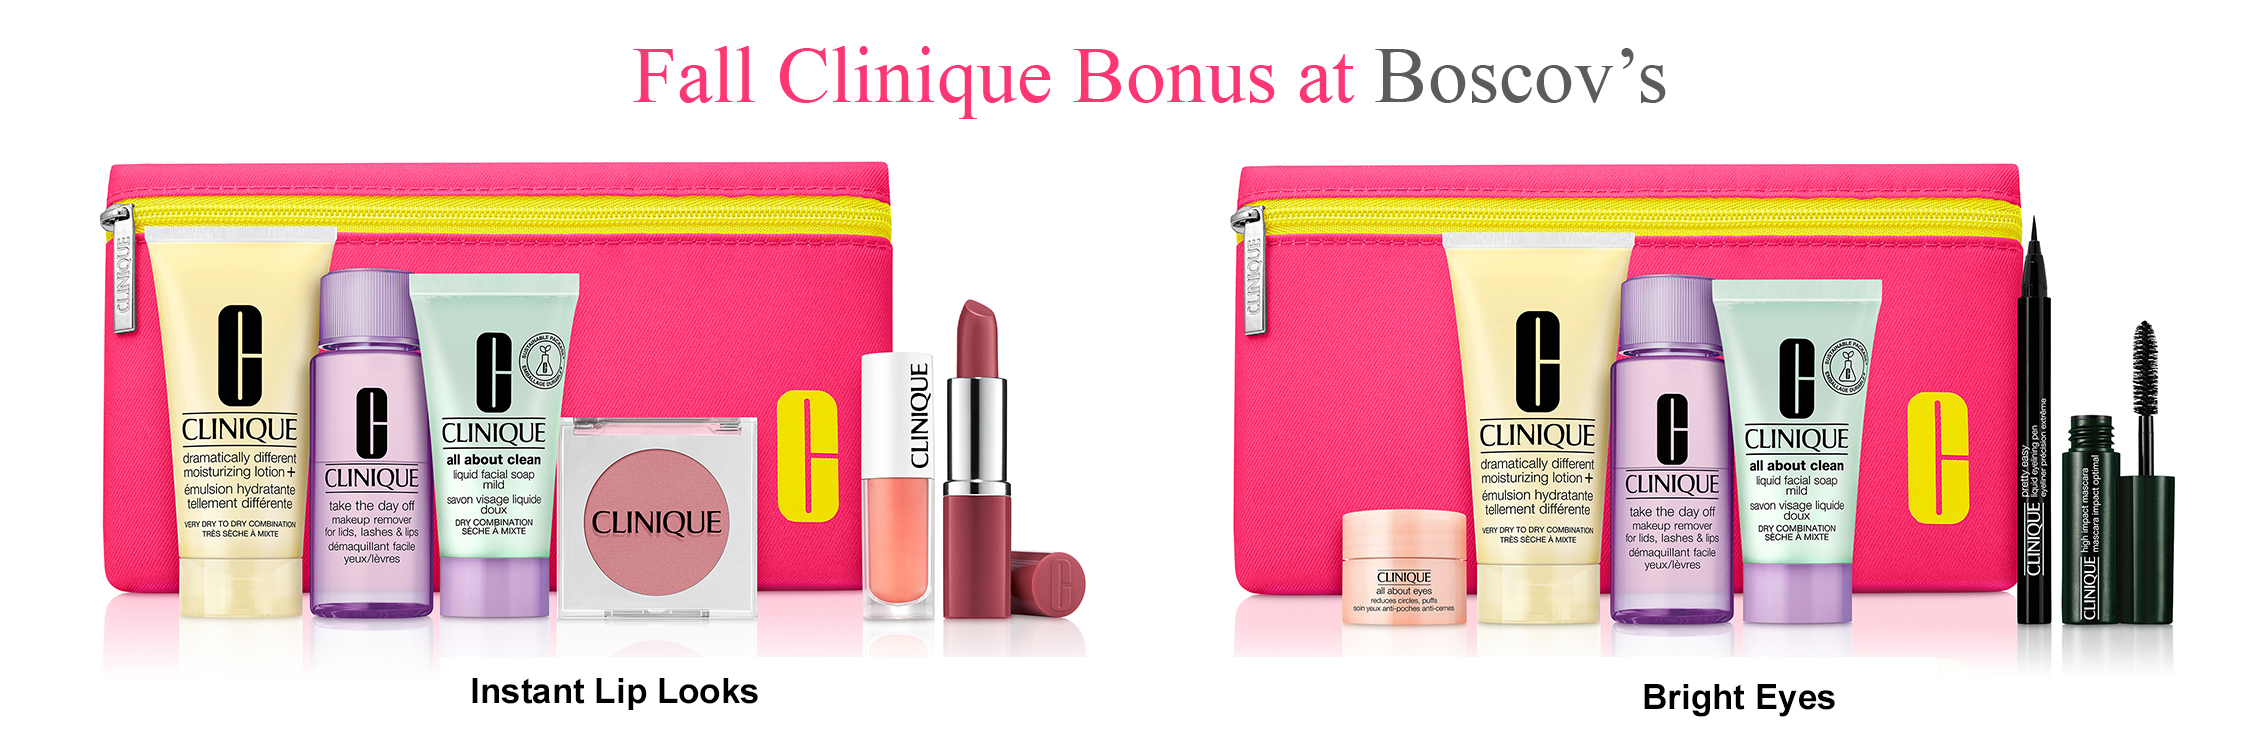 Fall bonus time at Boscov's 2020 in 2020 Clinique gift